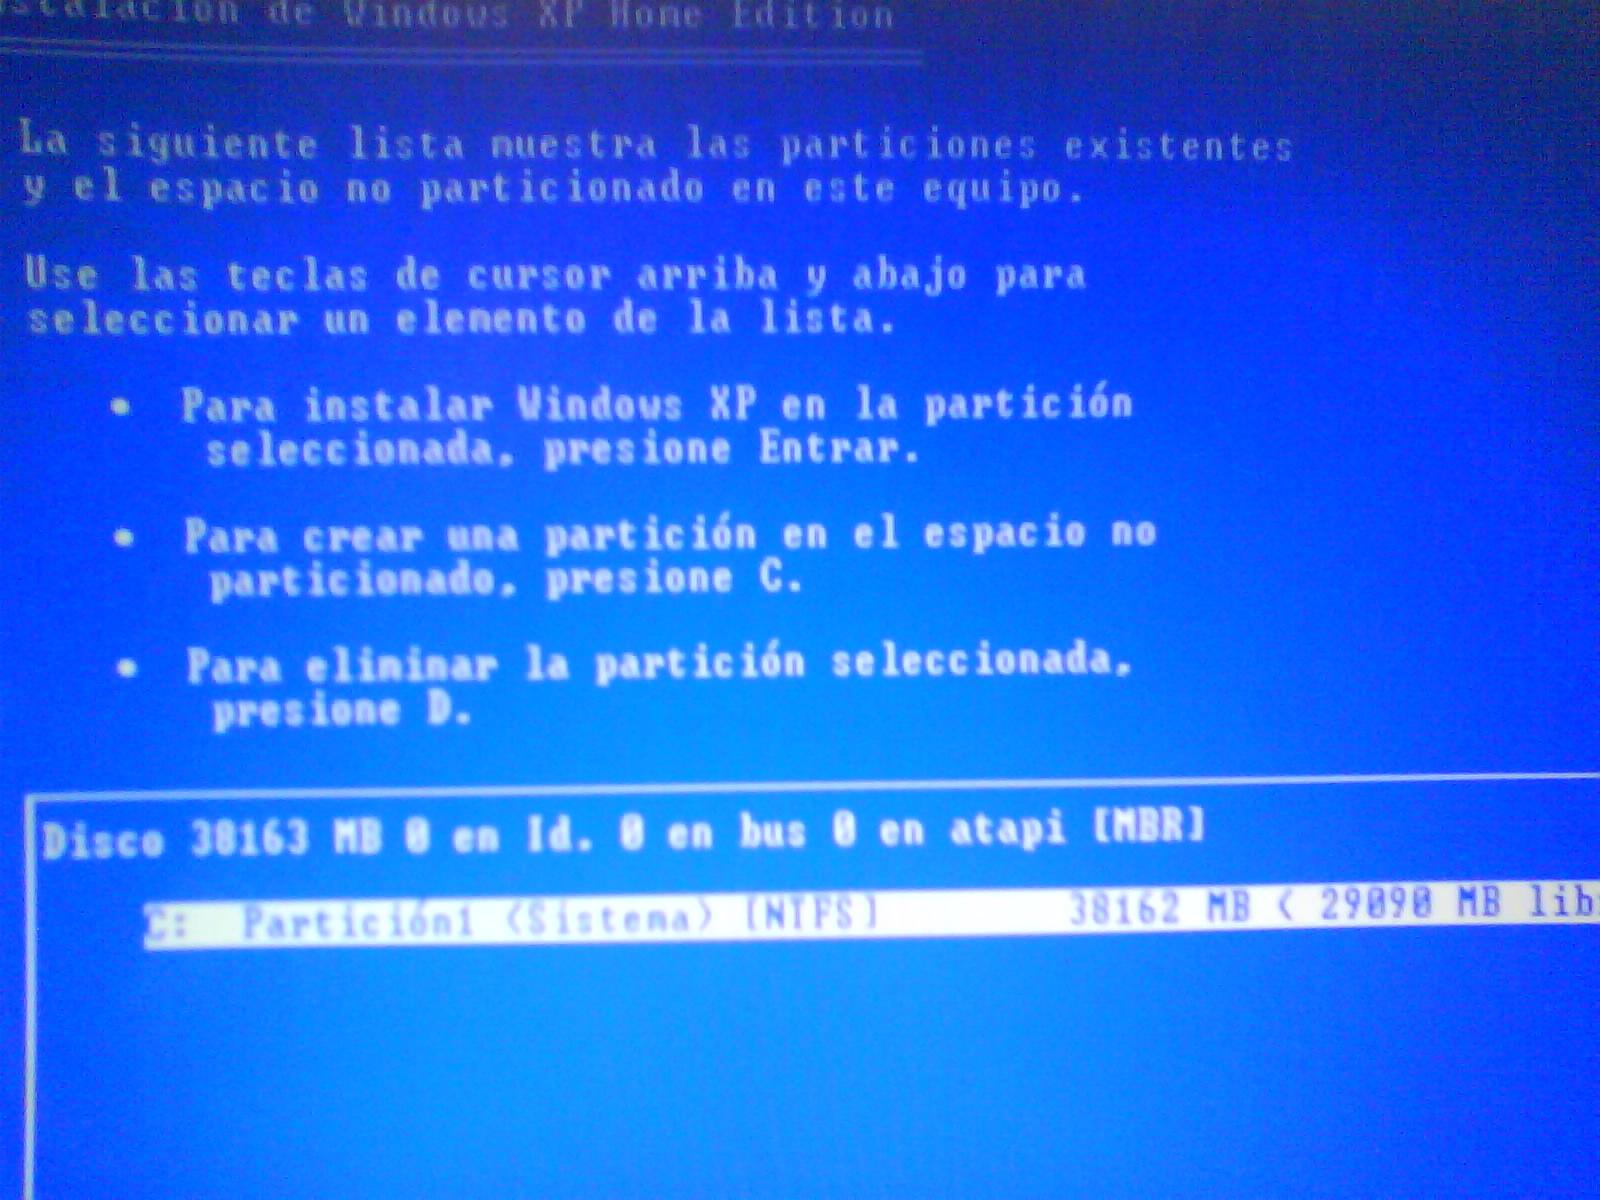 disco instalacion windows xp: